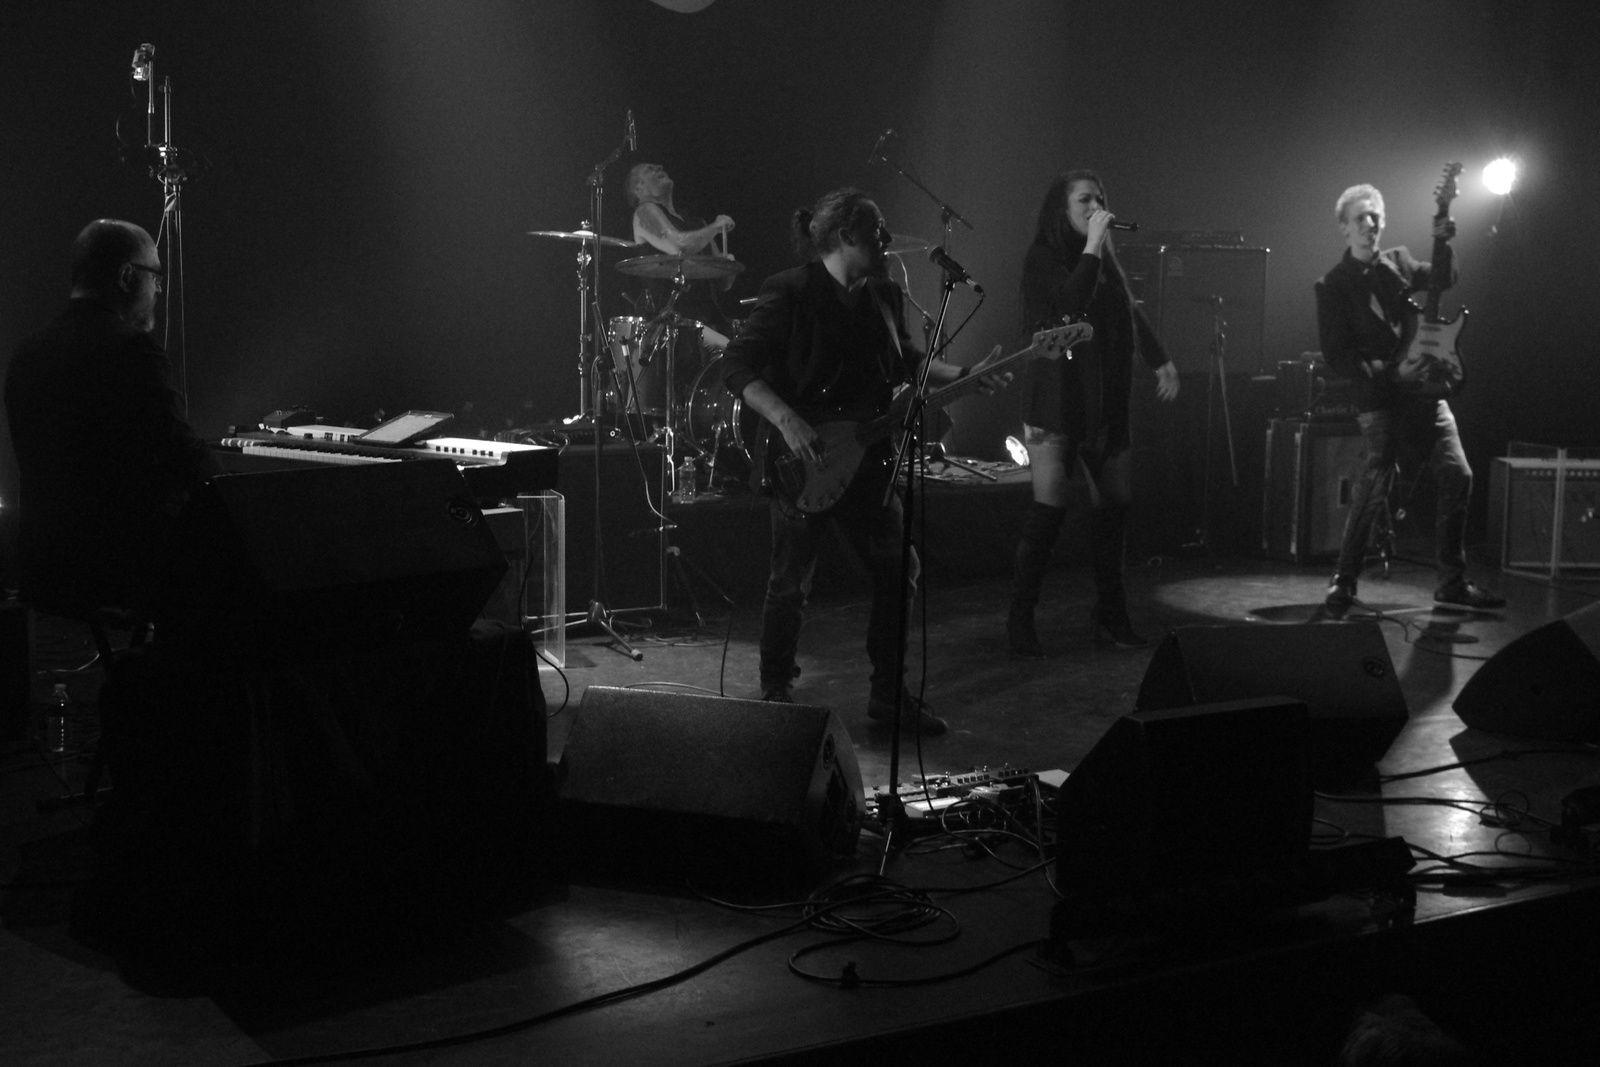 Rosedale - 25/11/2017 - Athena Blues Festival, St Saulve (59)